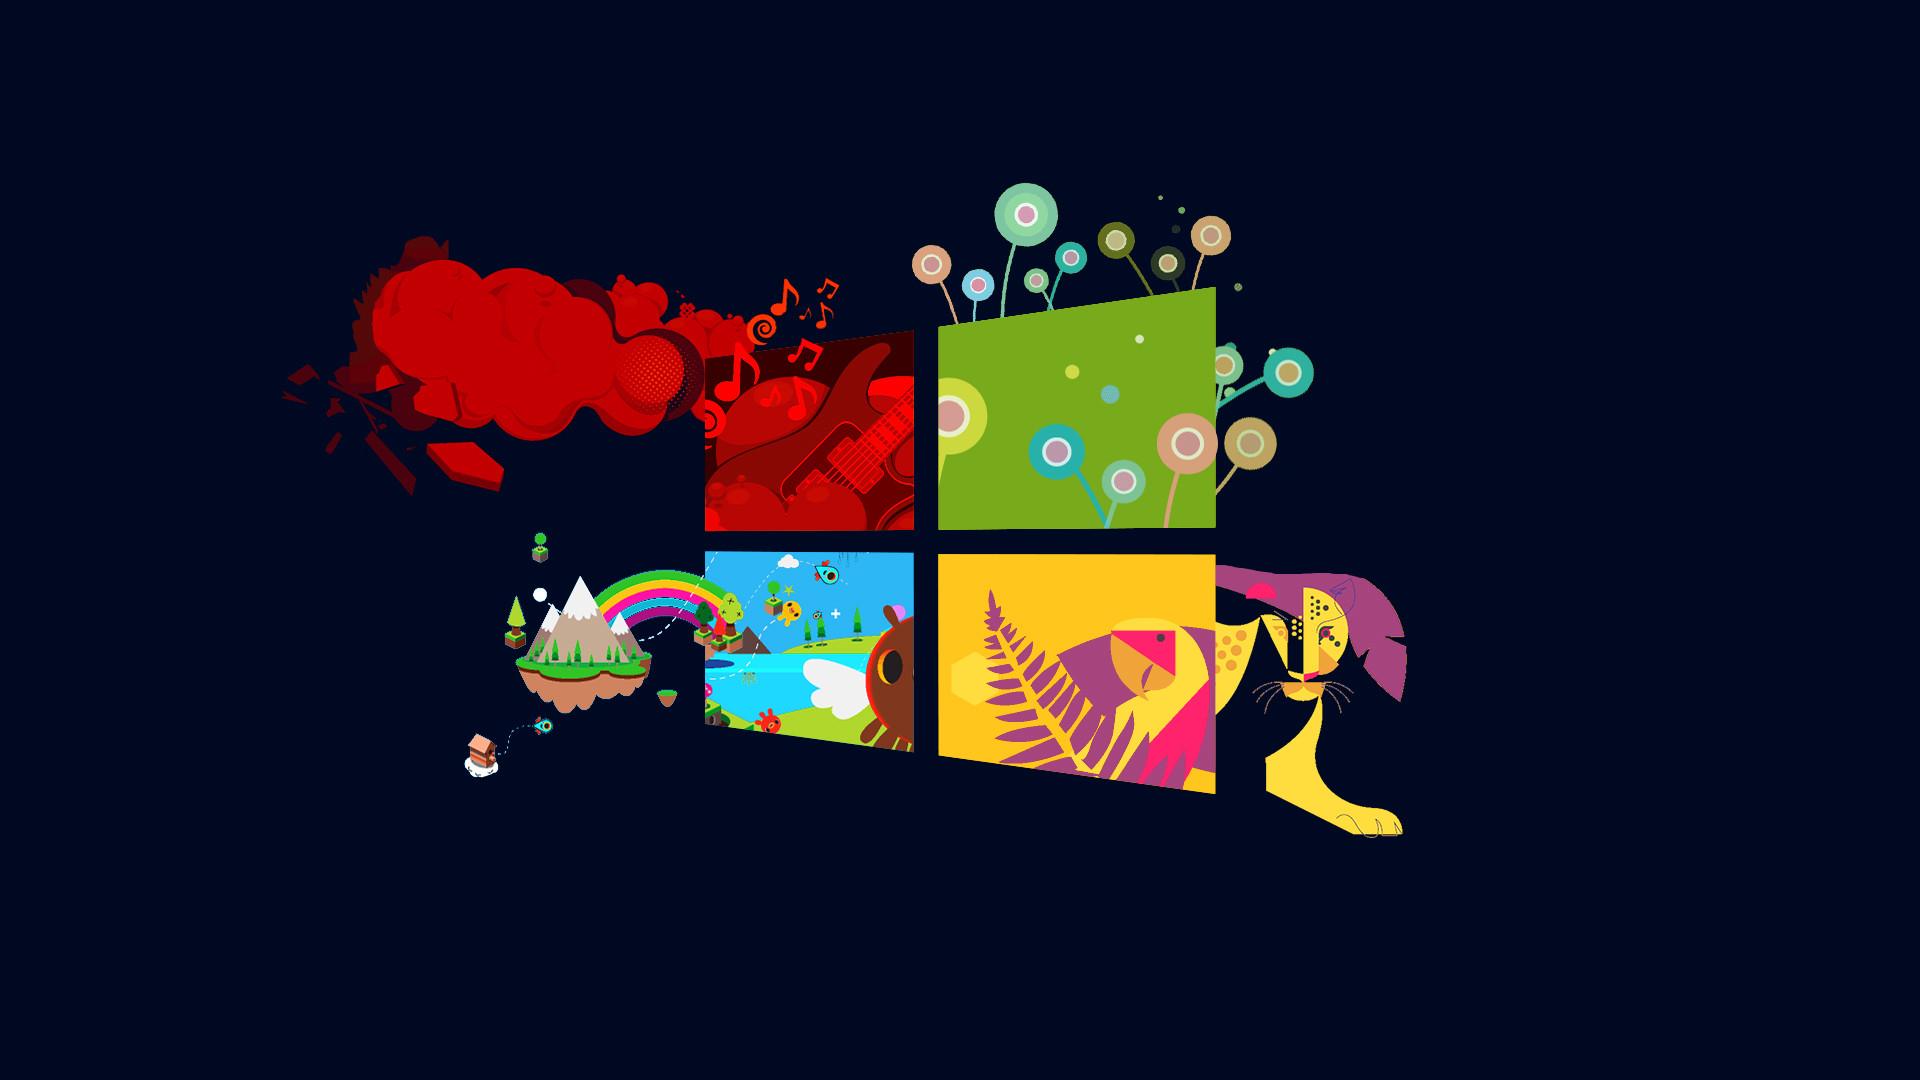 Windows 8 1 Wallpapers 1024x576 Px Source Rohan